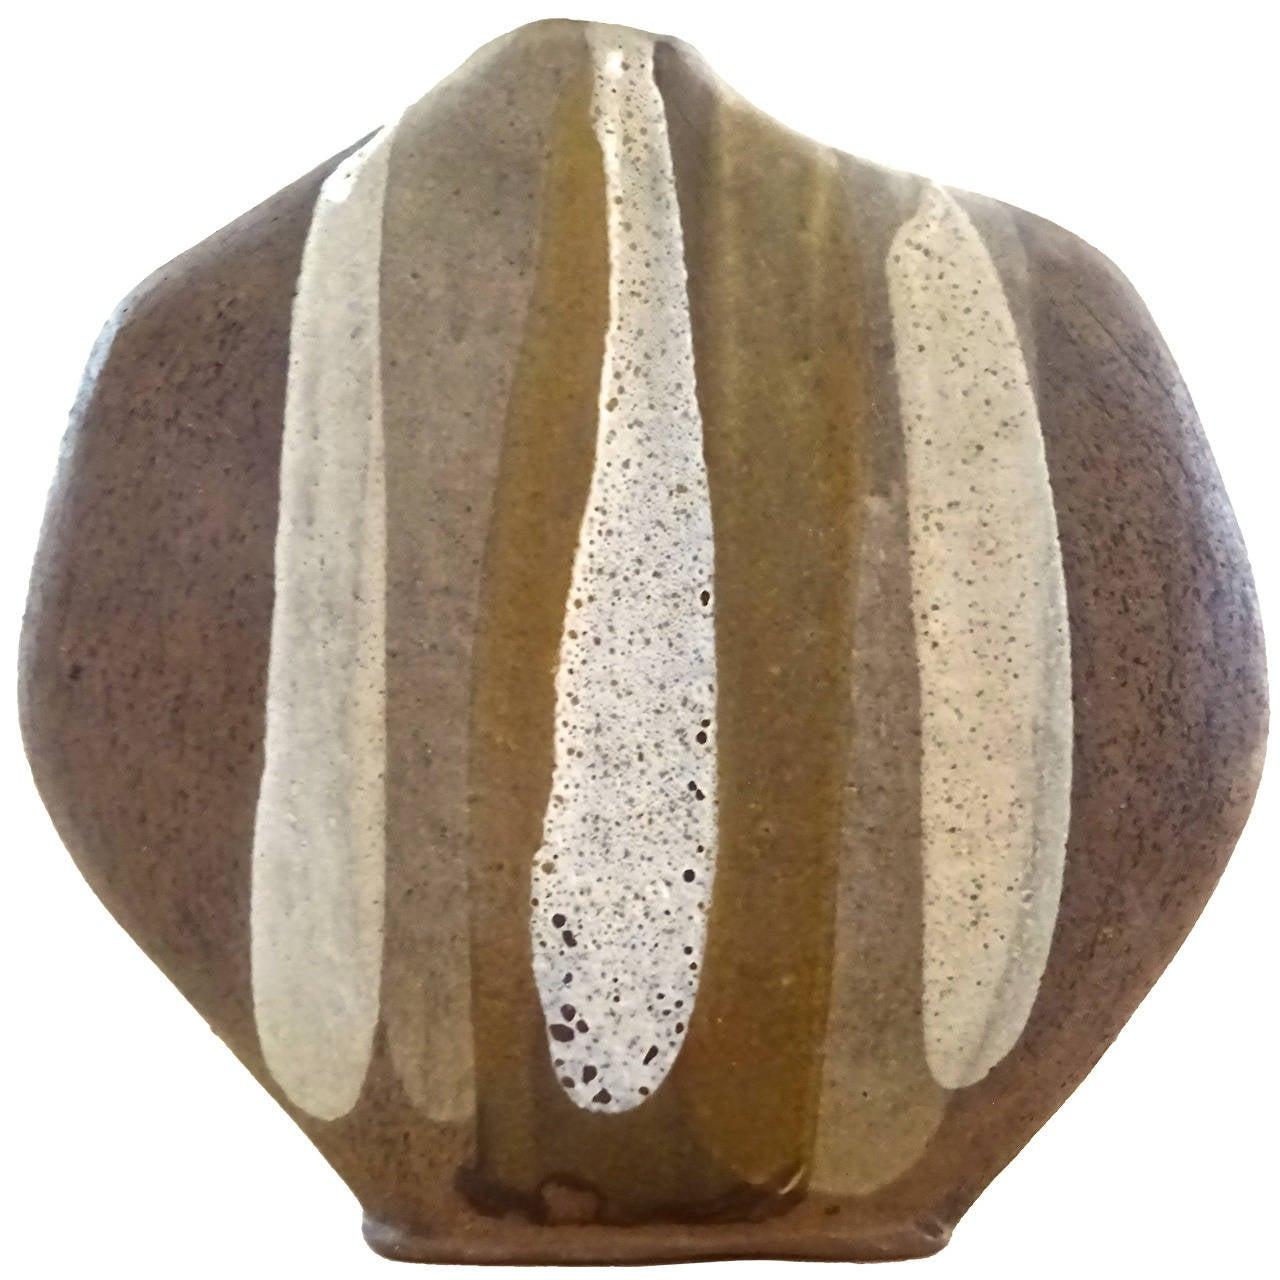 Rare 1950s david cressey studio slab built flame glaze art rare 1950s david cressey studio slab built flame glaze art pottery vase for sale reviewsmspy